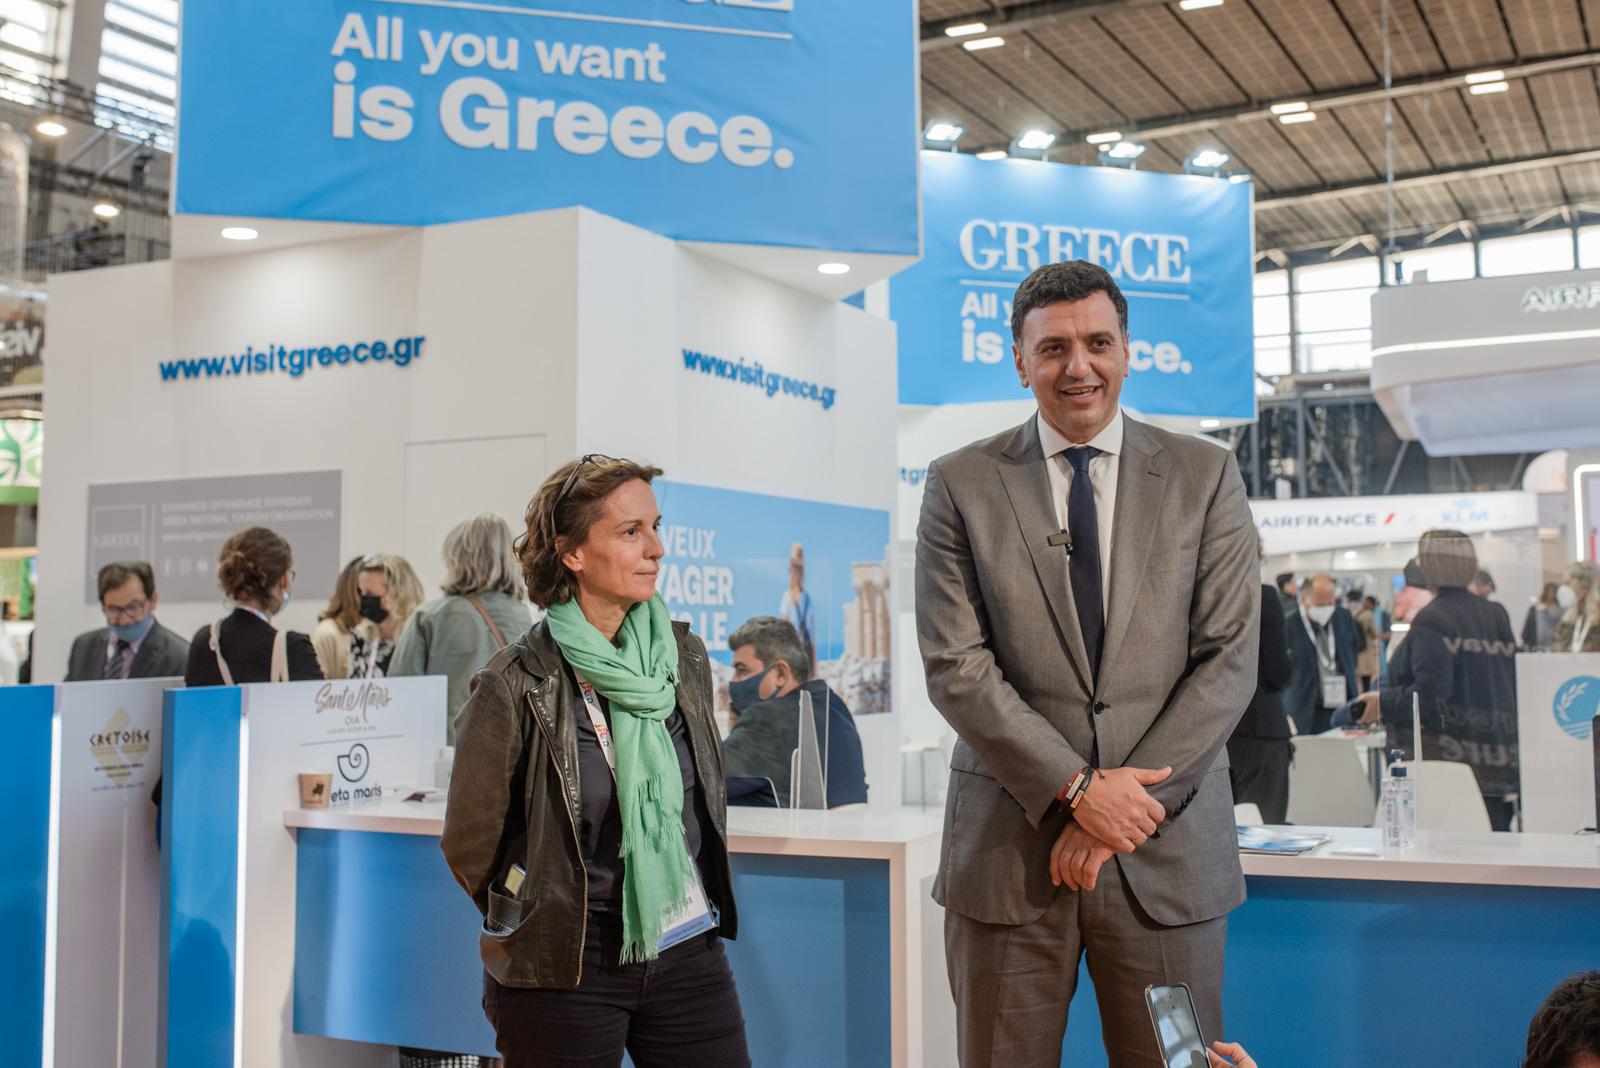 Transavia: Δέσμευση για αύξηση των αεροπορικών θέσεων από Ολλανδία προς Ελλάδα κατά 50%